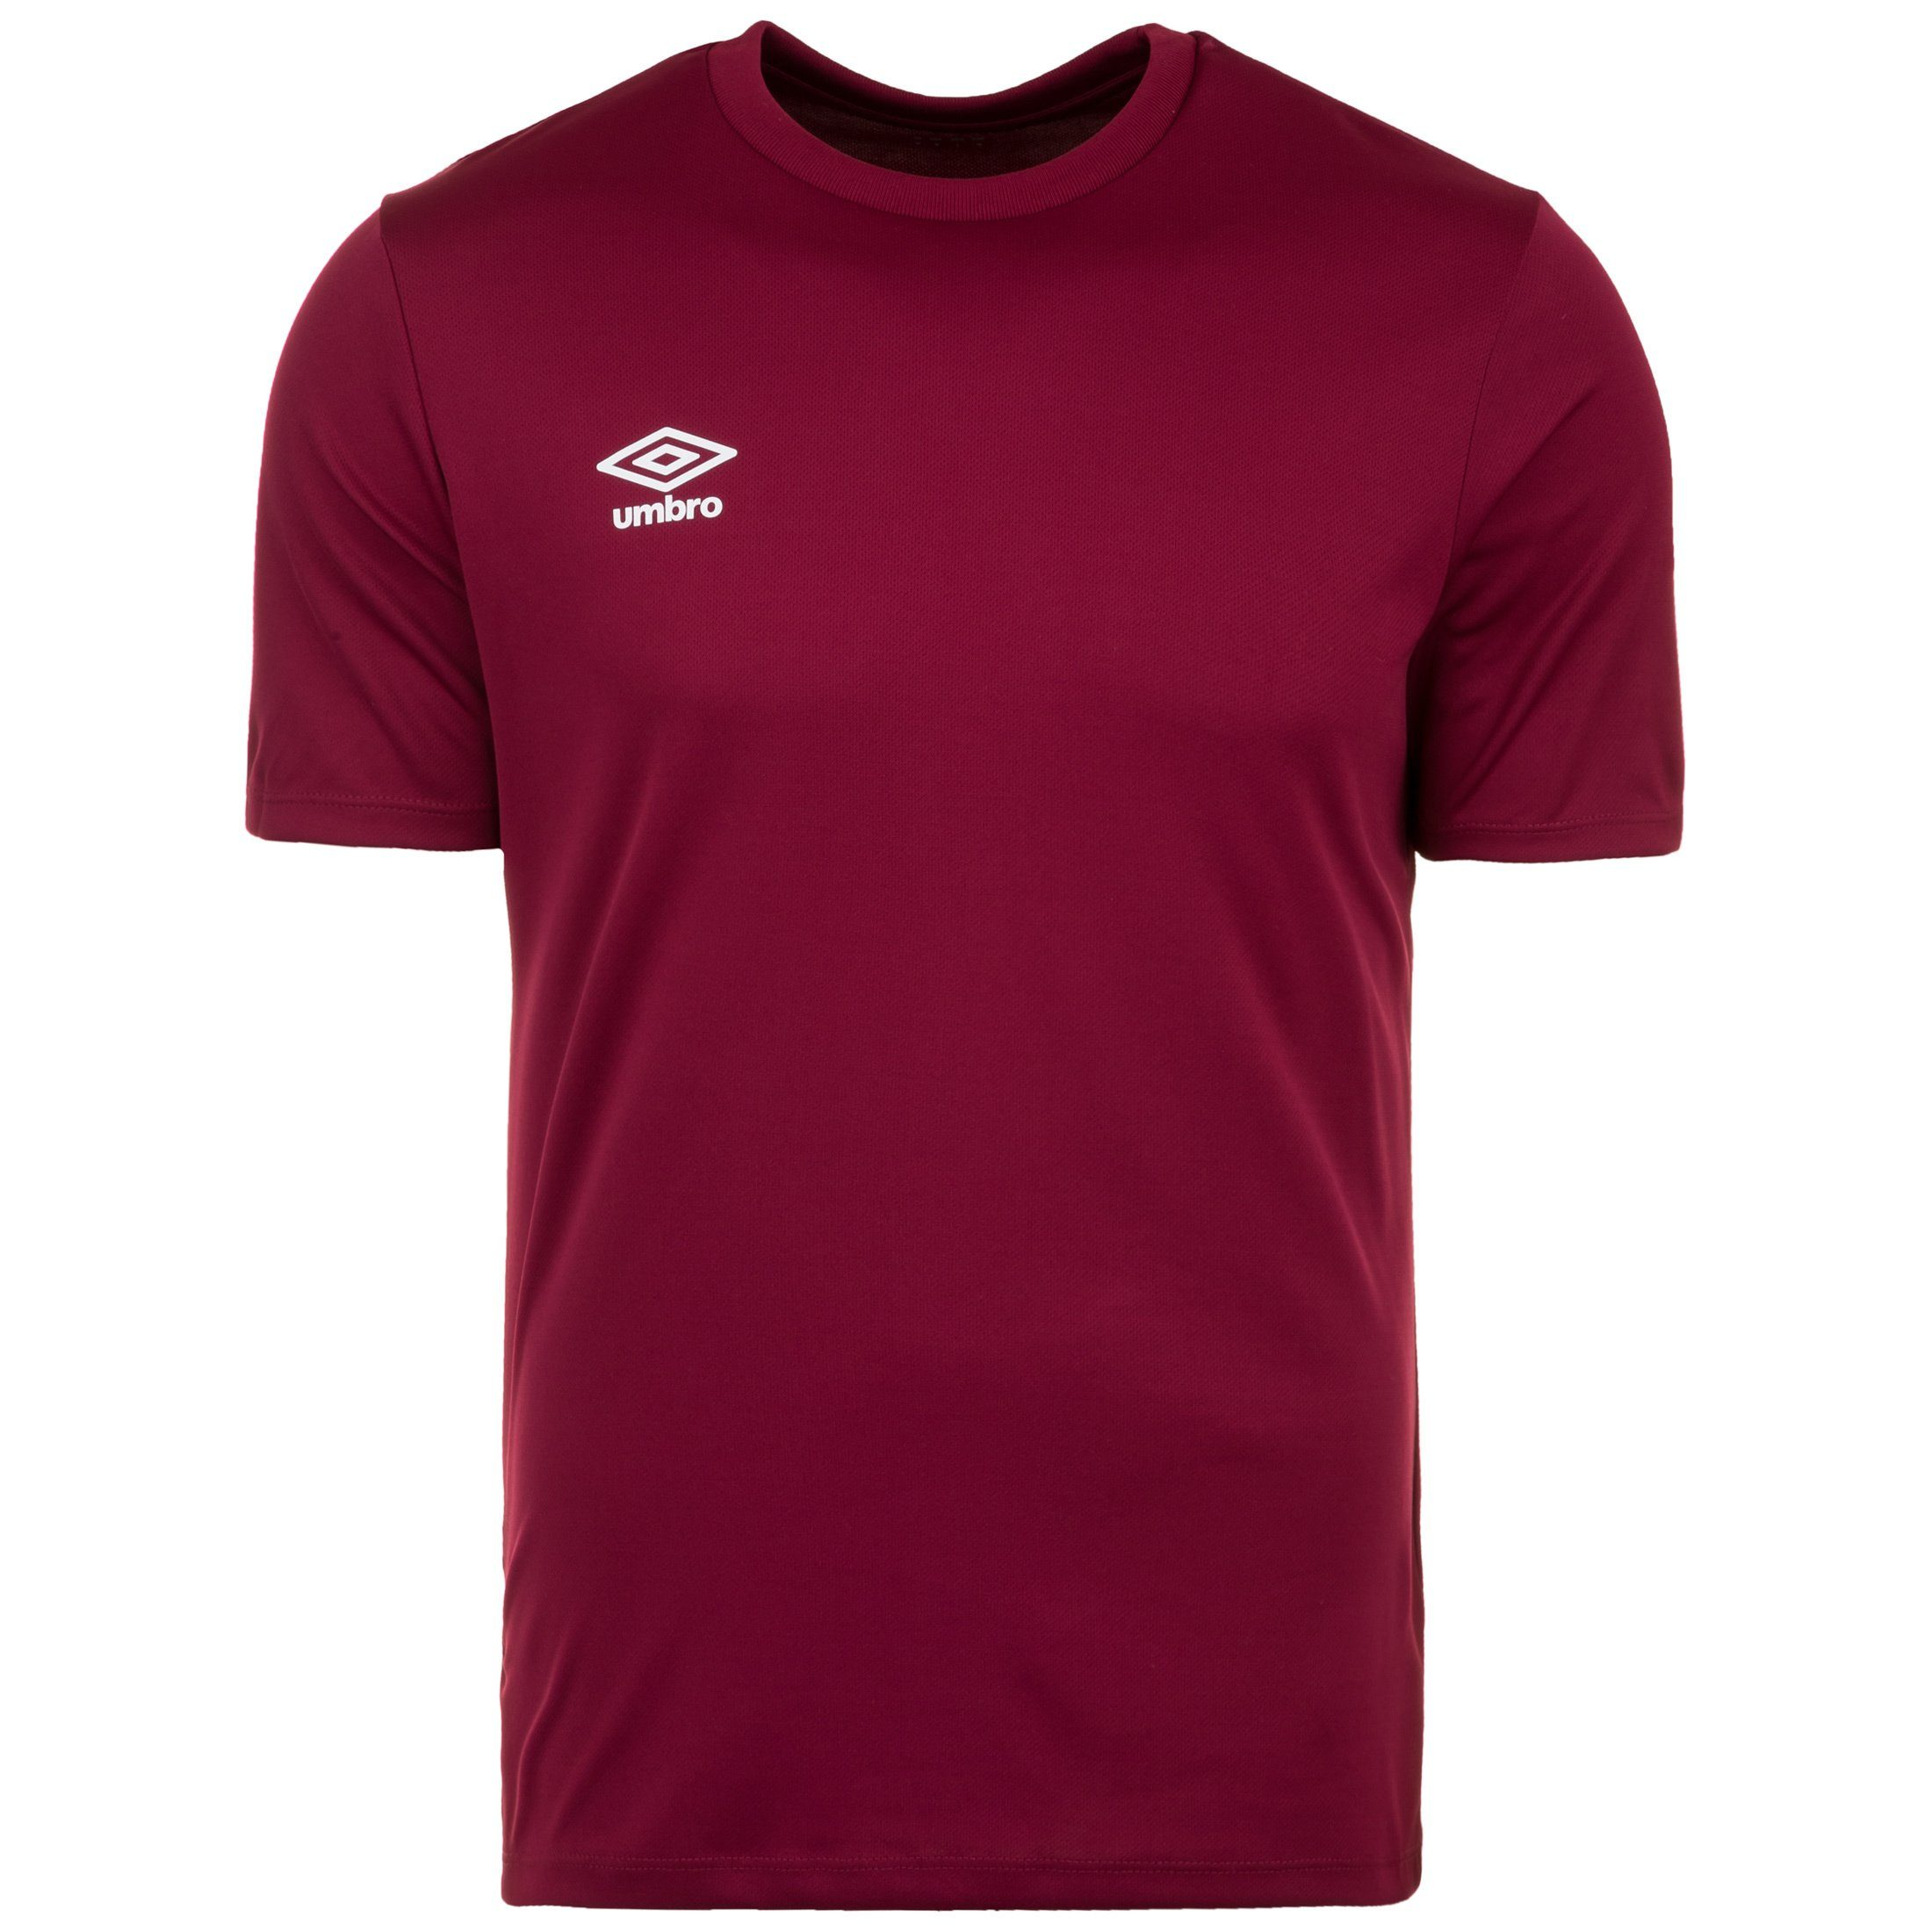 Umbro Fußballtrikot Club Jersey Ss   Sportbekleidung > Trikots > Fußballtrikots   Rot   Umbro